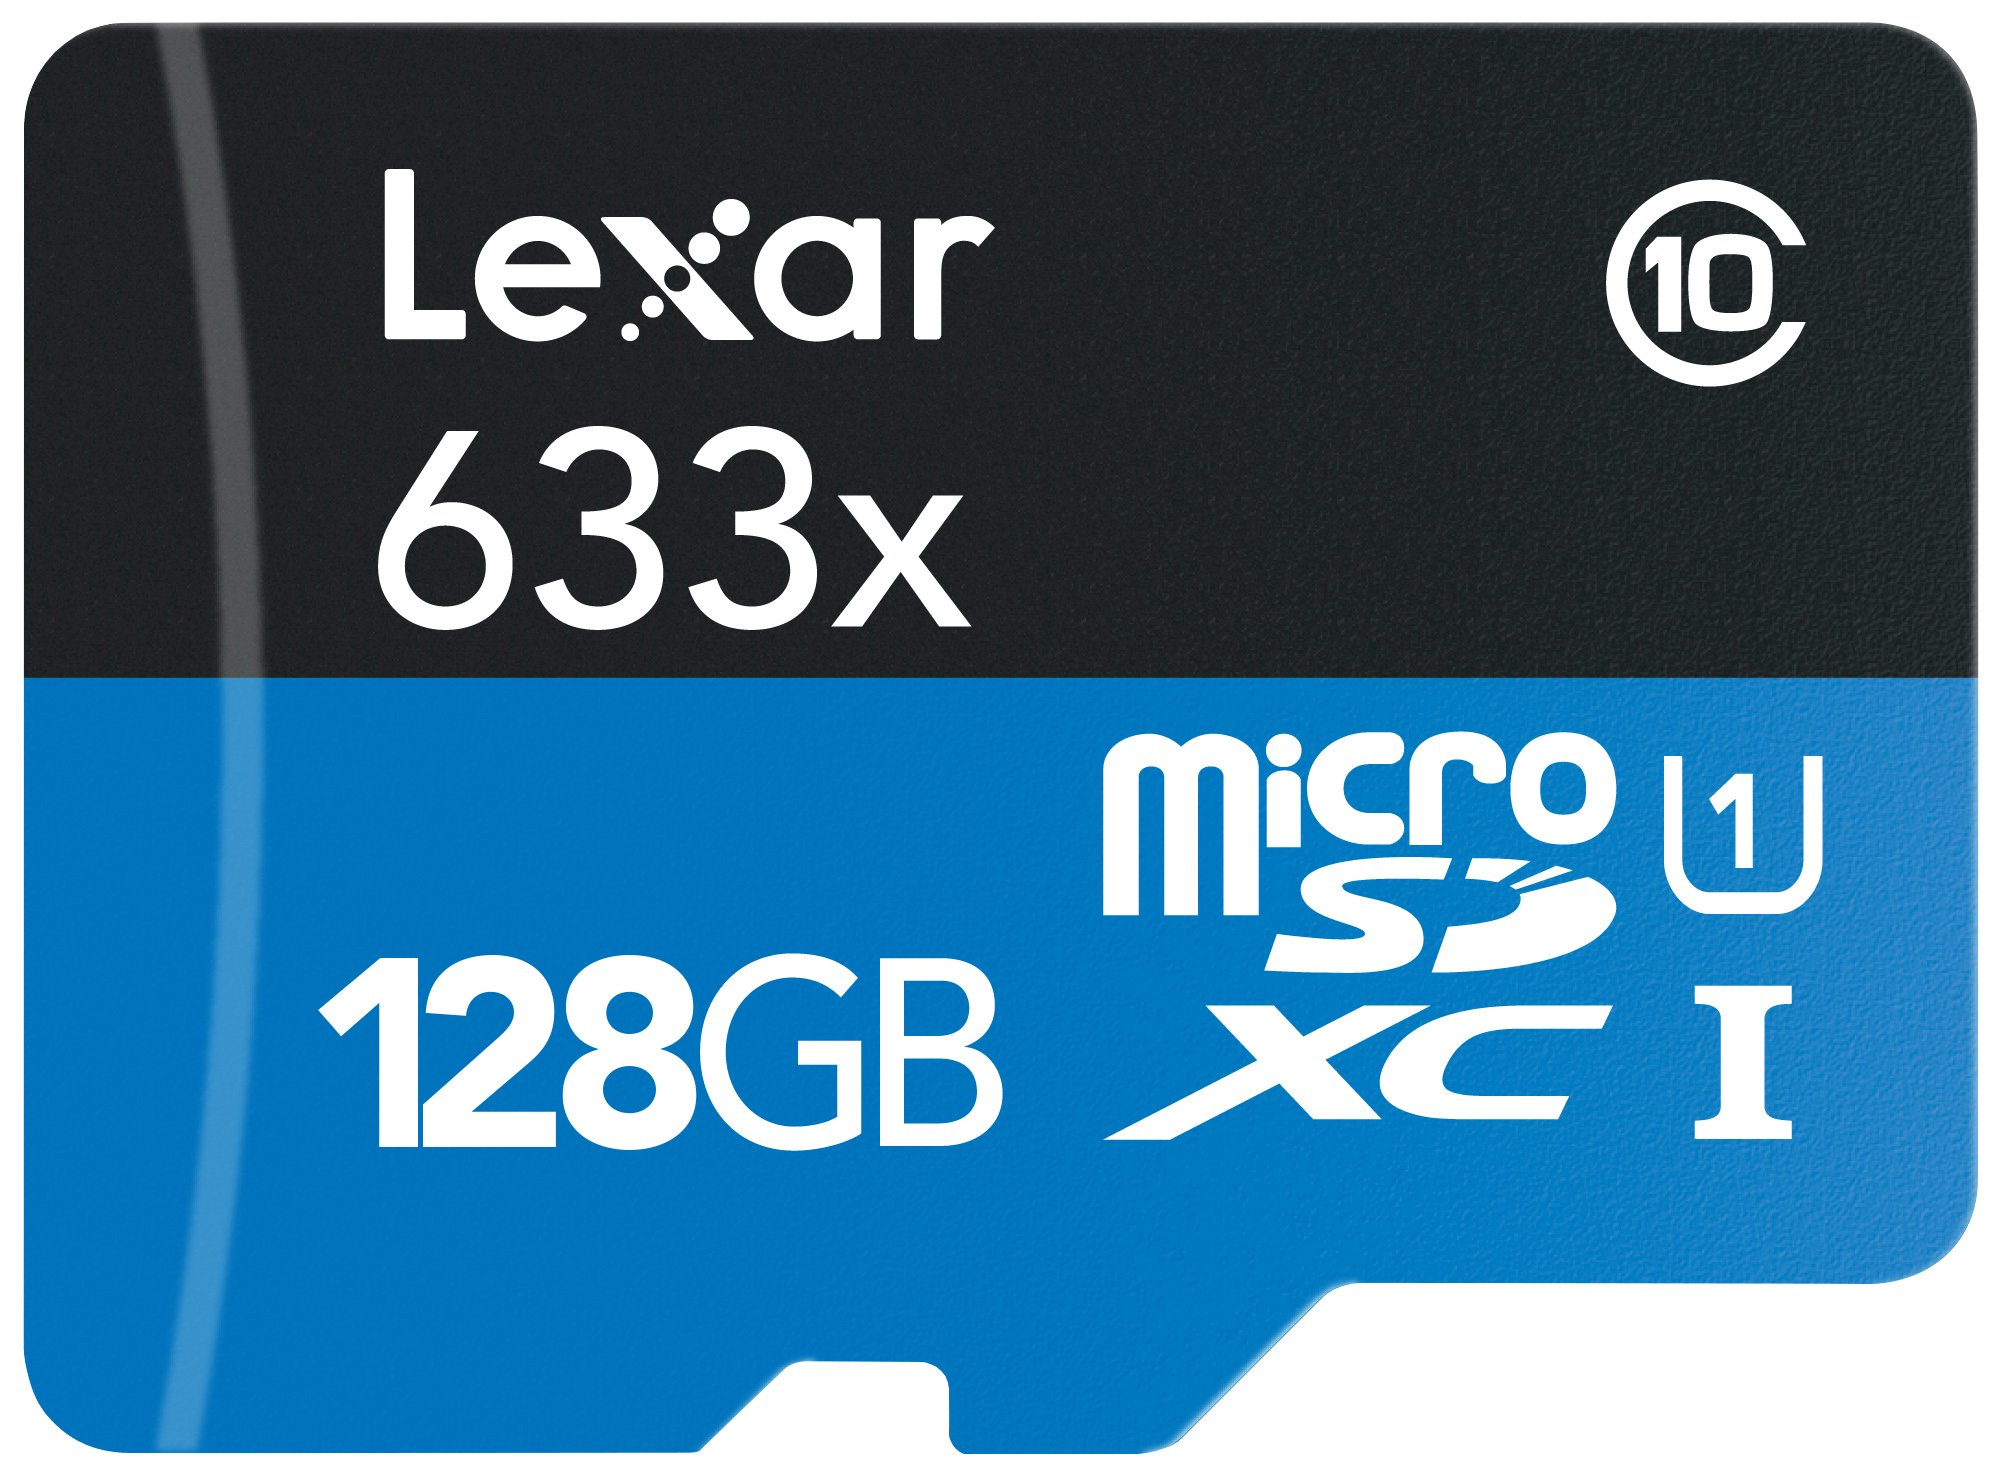 Lexar High-Performance microSDXC 633x 128GB UHS-I Card w/SD Adapter - LSDMI128BBNL633A